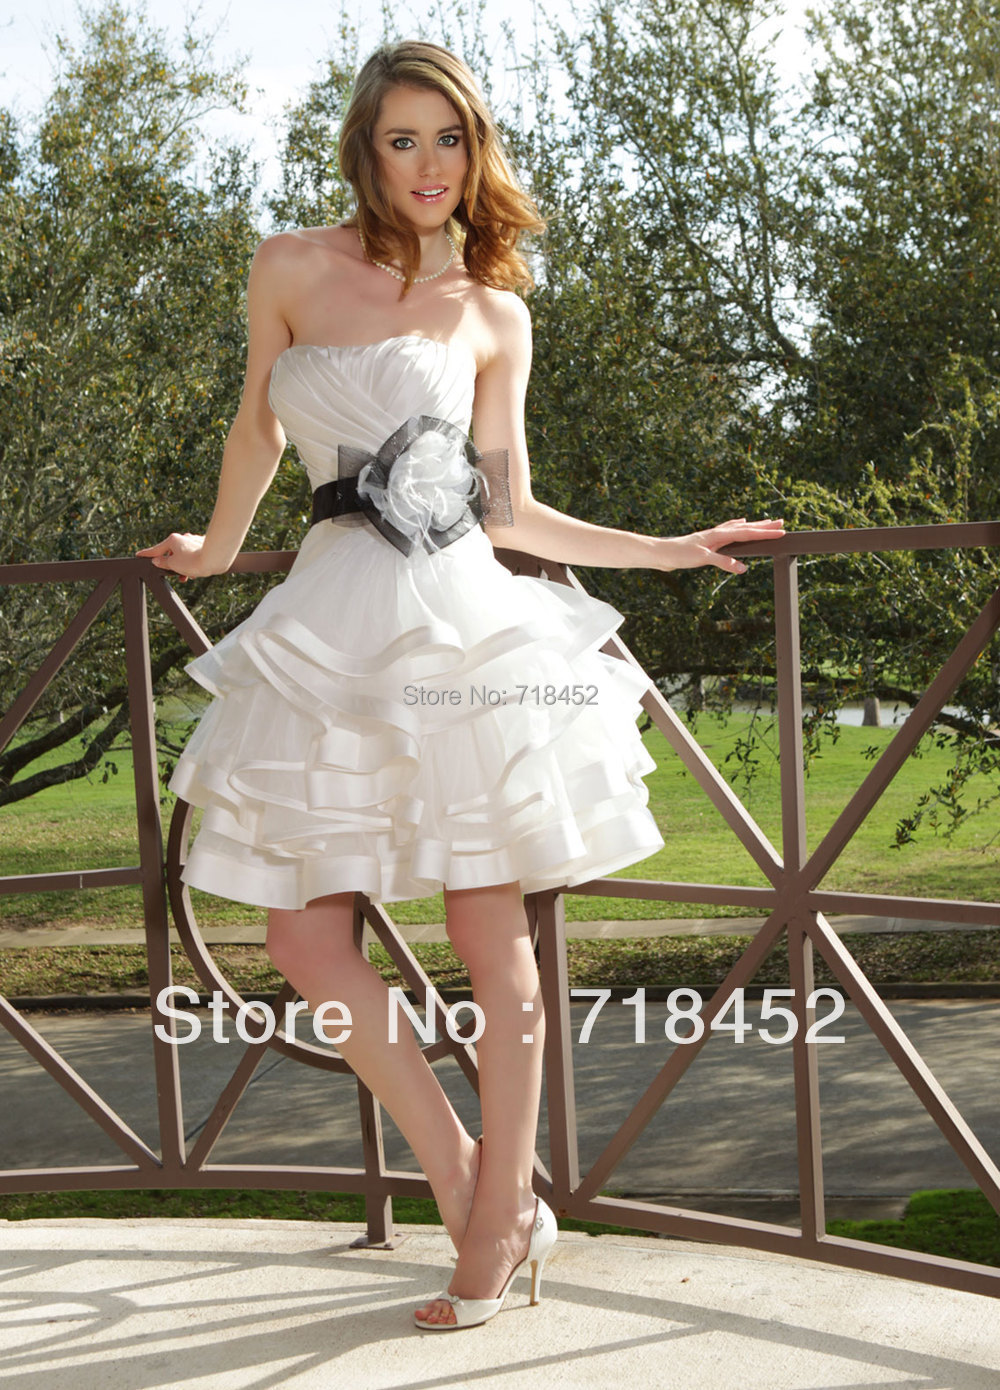 2013 free shipping hot sale short wedding dress white for Short wedding dress sale